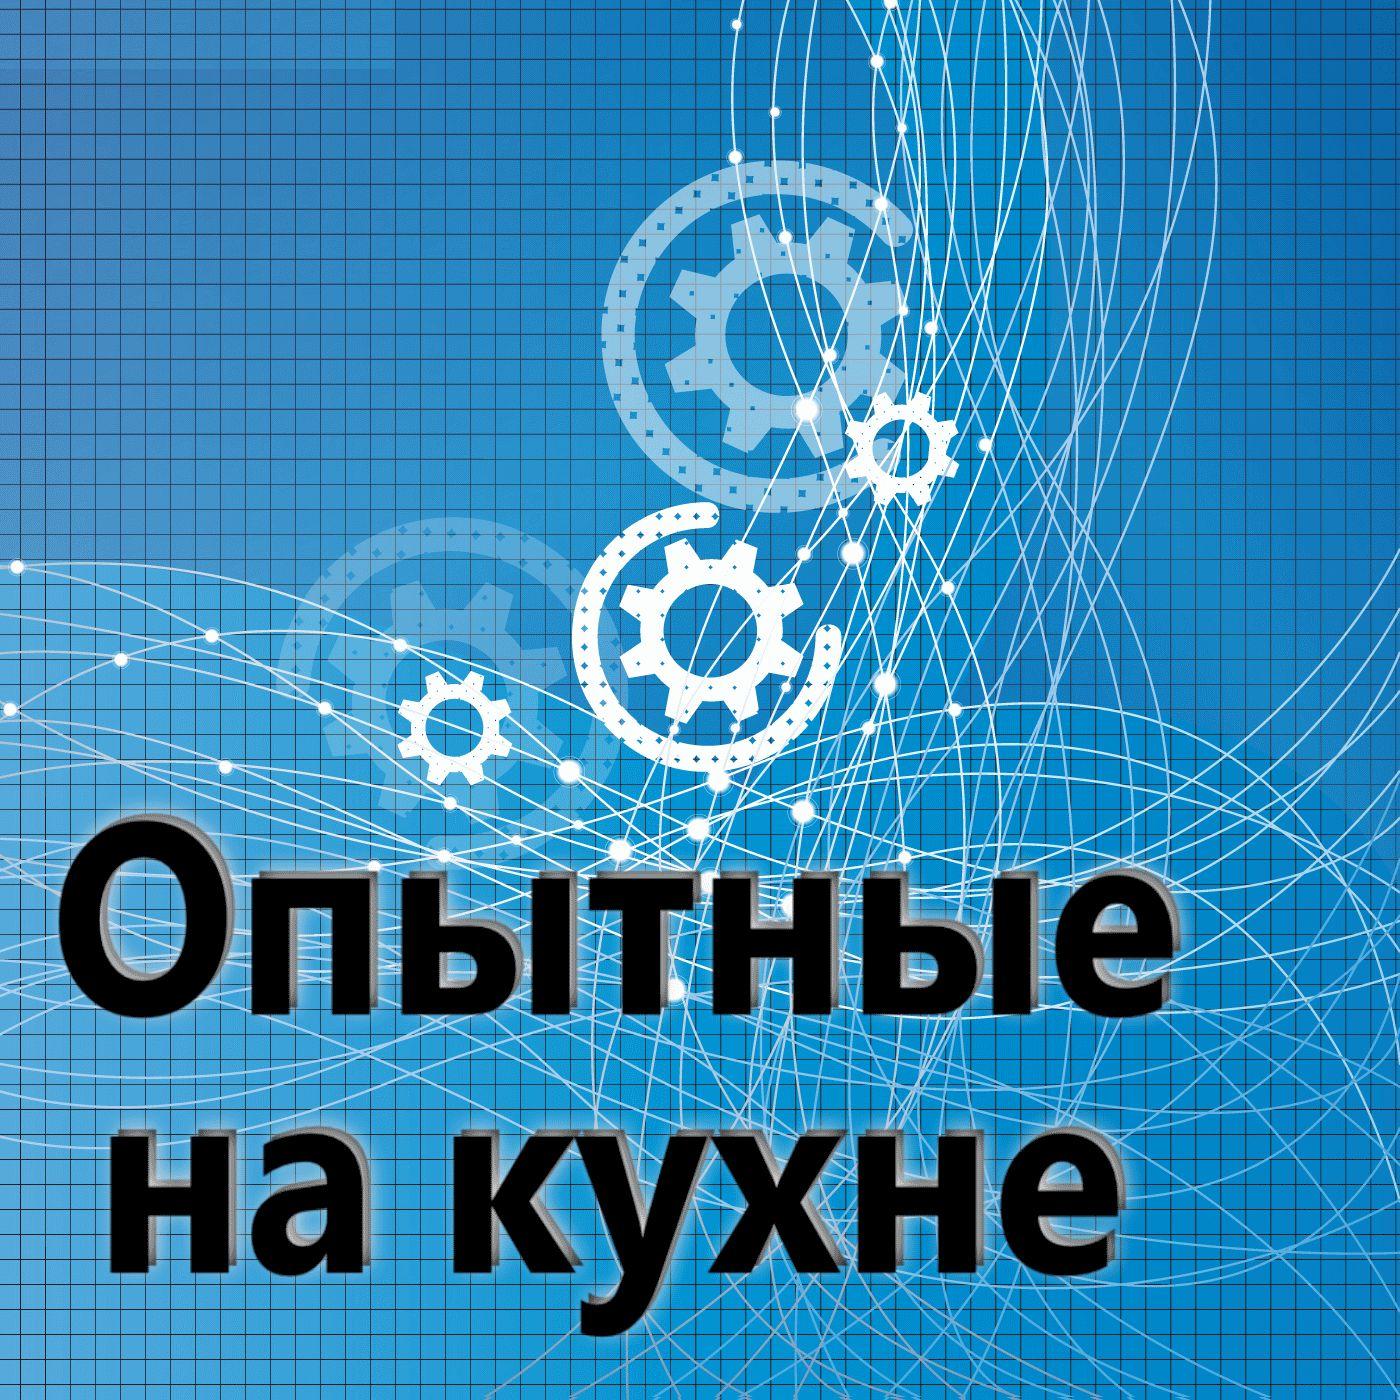 Евгений Плешивцев Опытные на кухне №048 запчасти